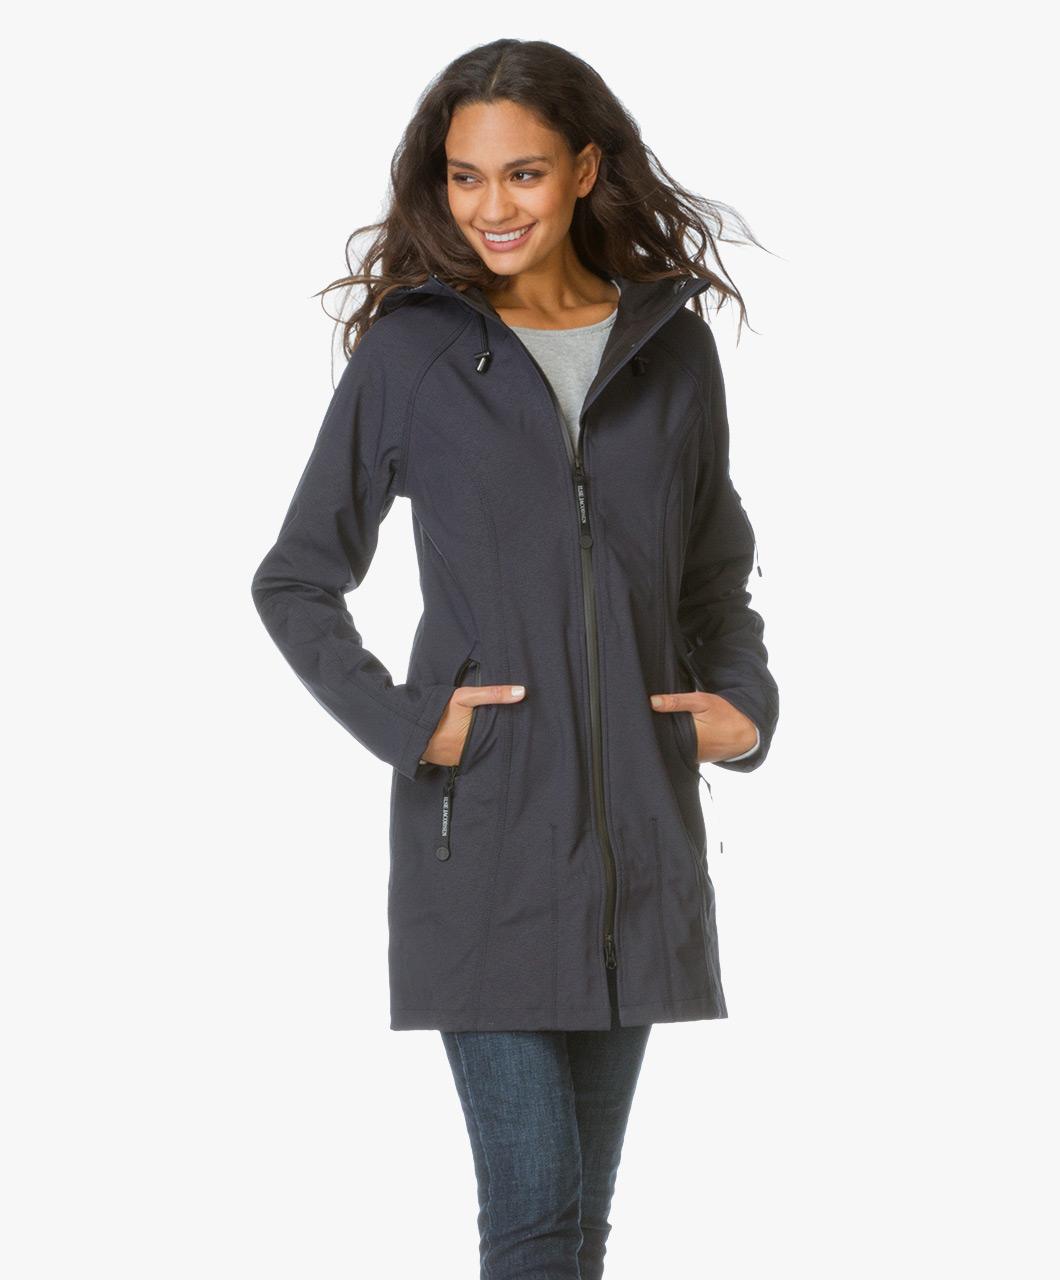 ilse jacobsen softshell raincoat rain37 indigo rain37 620 indigo. Black Bedroom Furniture Sets. Home Design Ideas